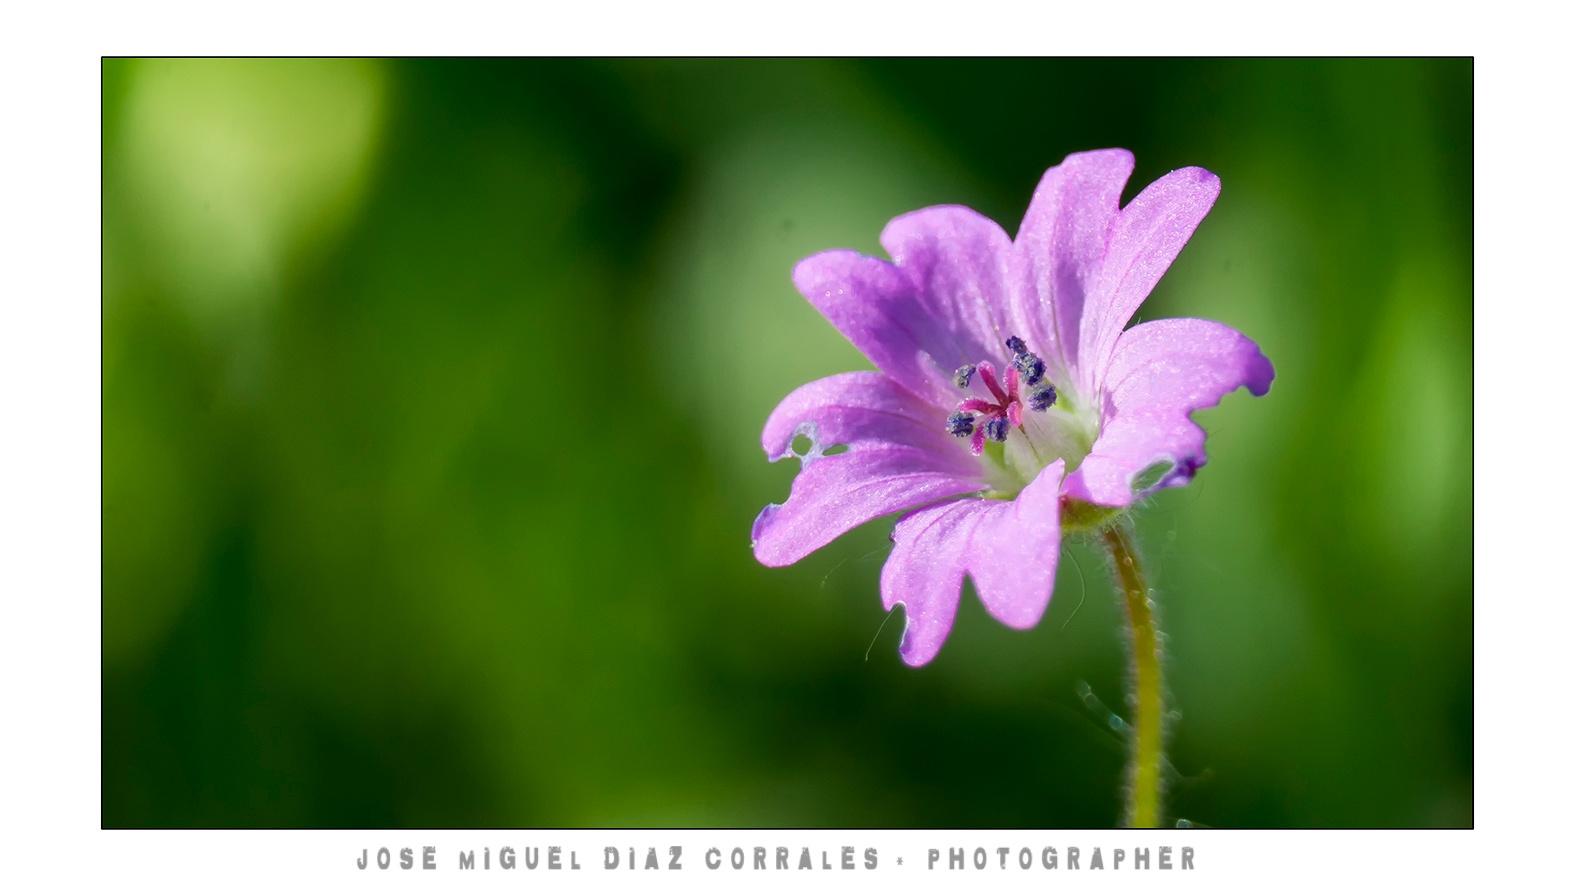 Flor by Josemigueldiazcorrales